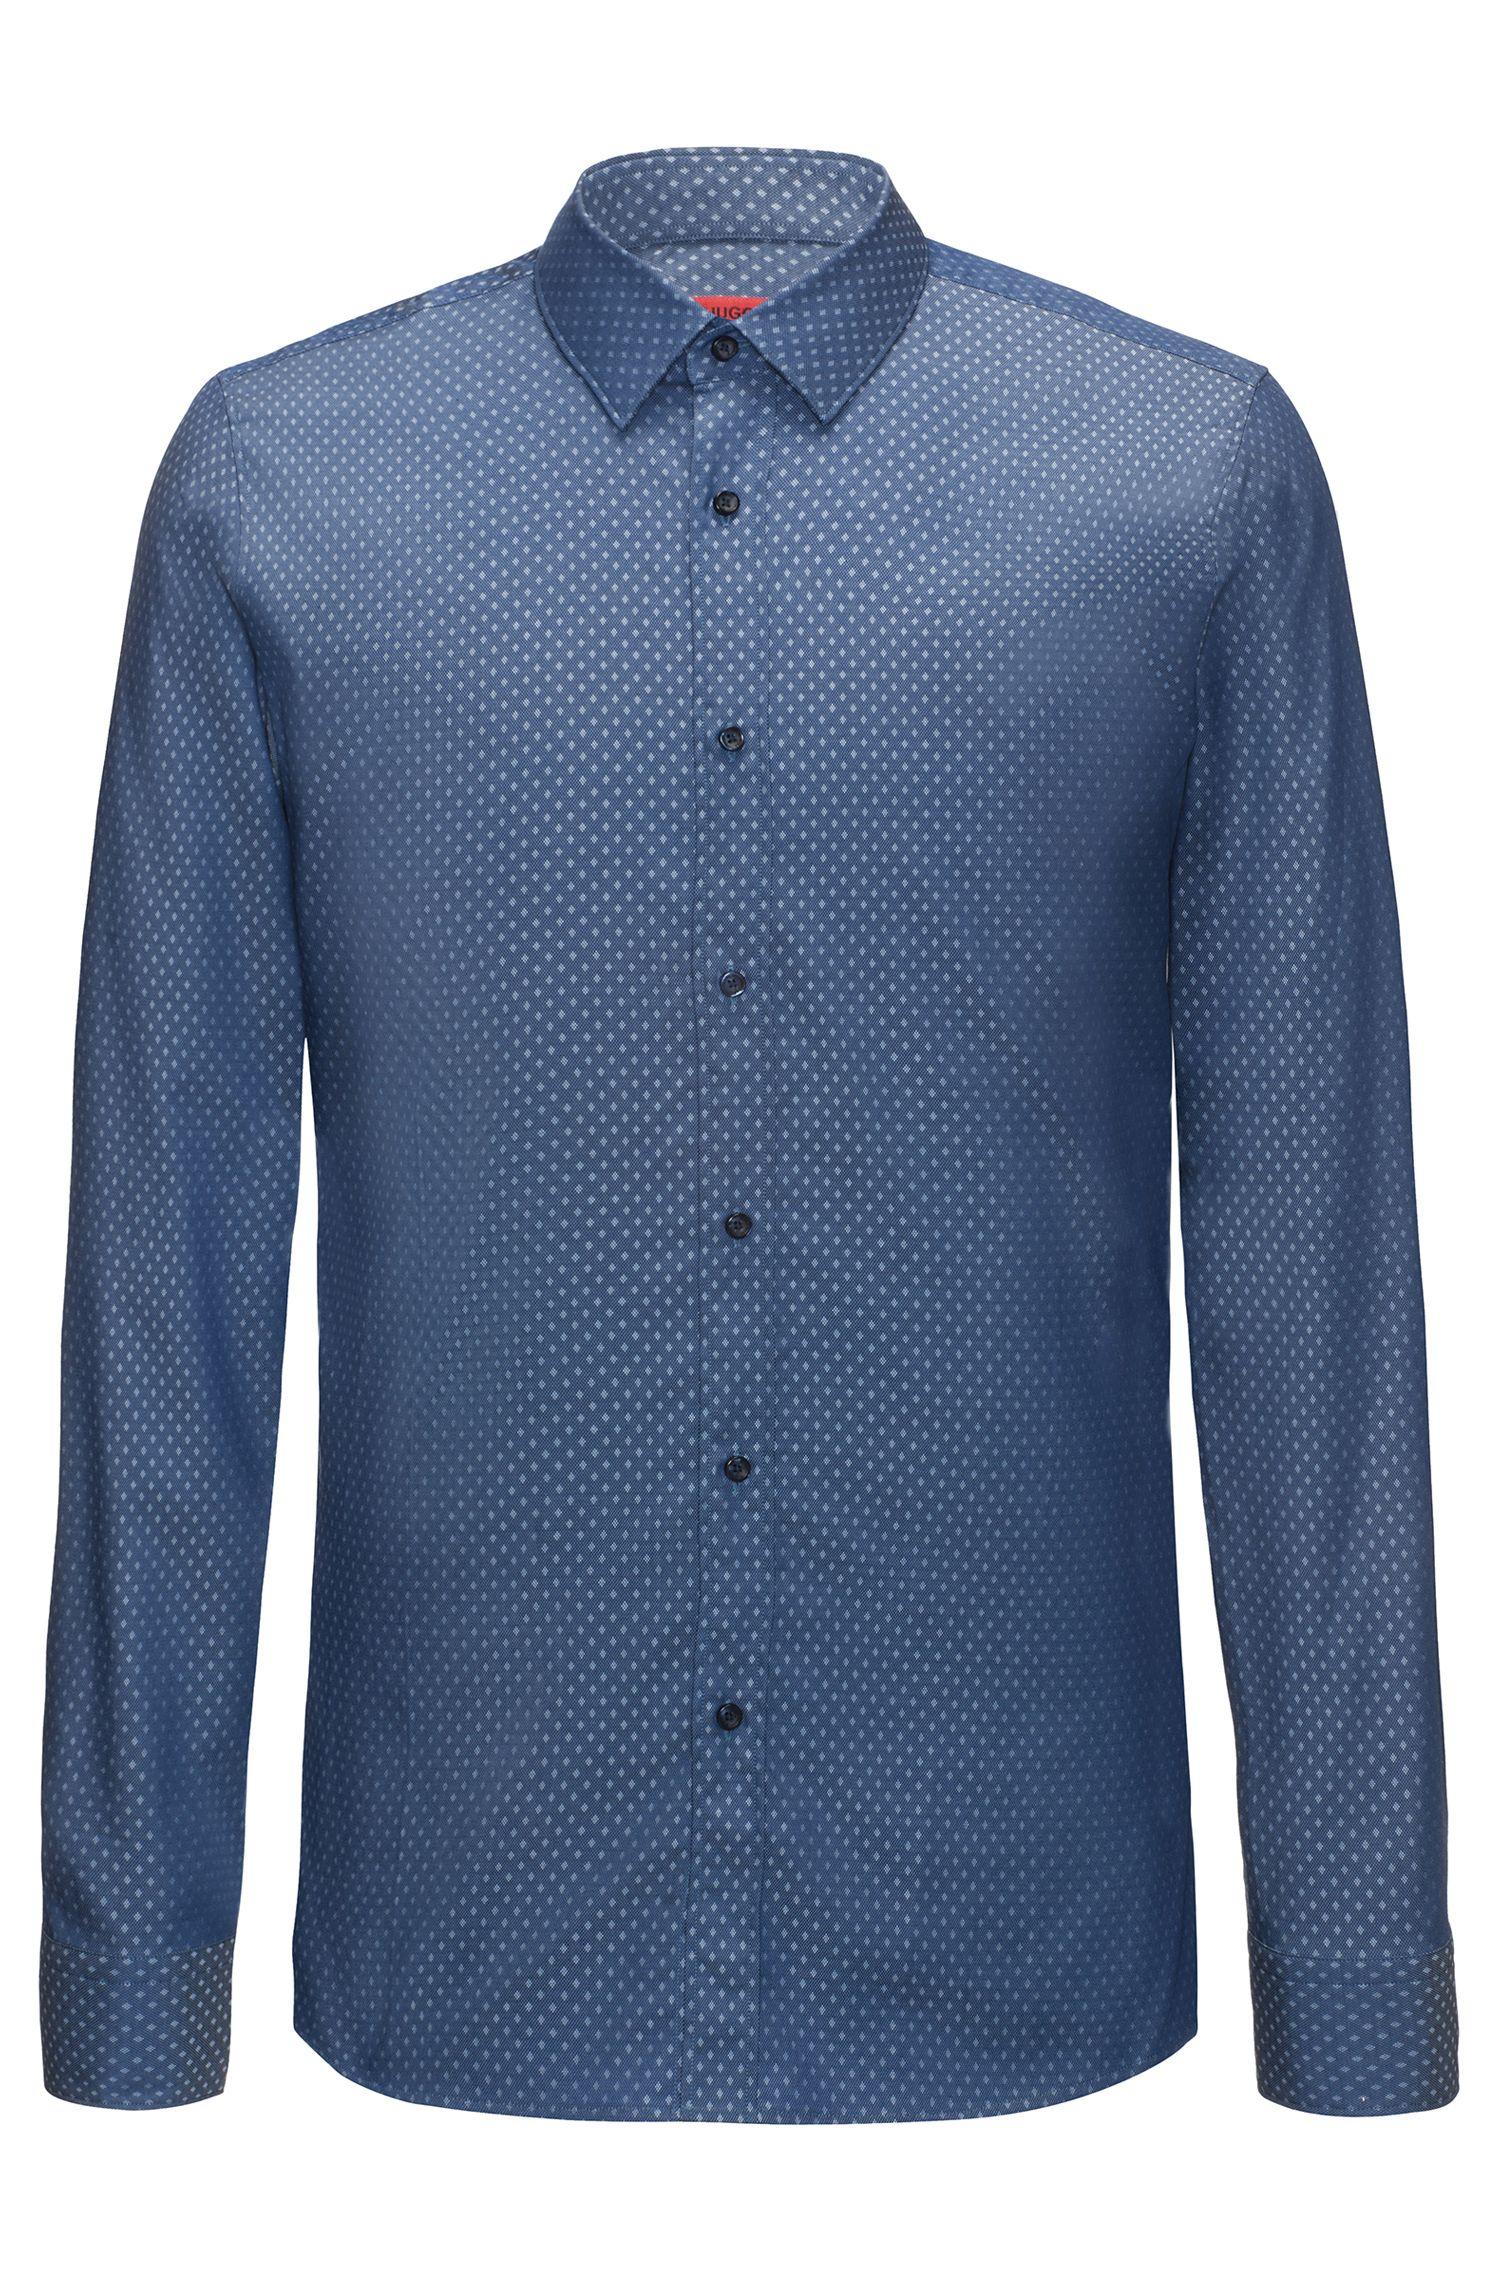 Diamond-Patterned Cotton Sport Shirt, Extra-Slim Fit | Elisha